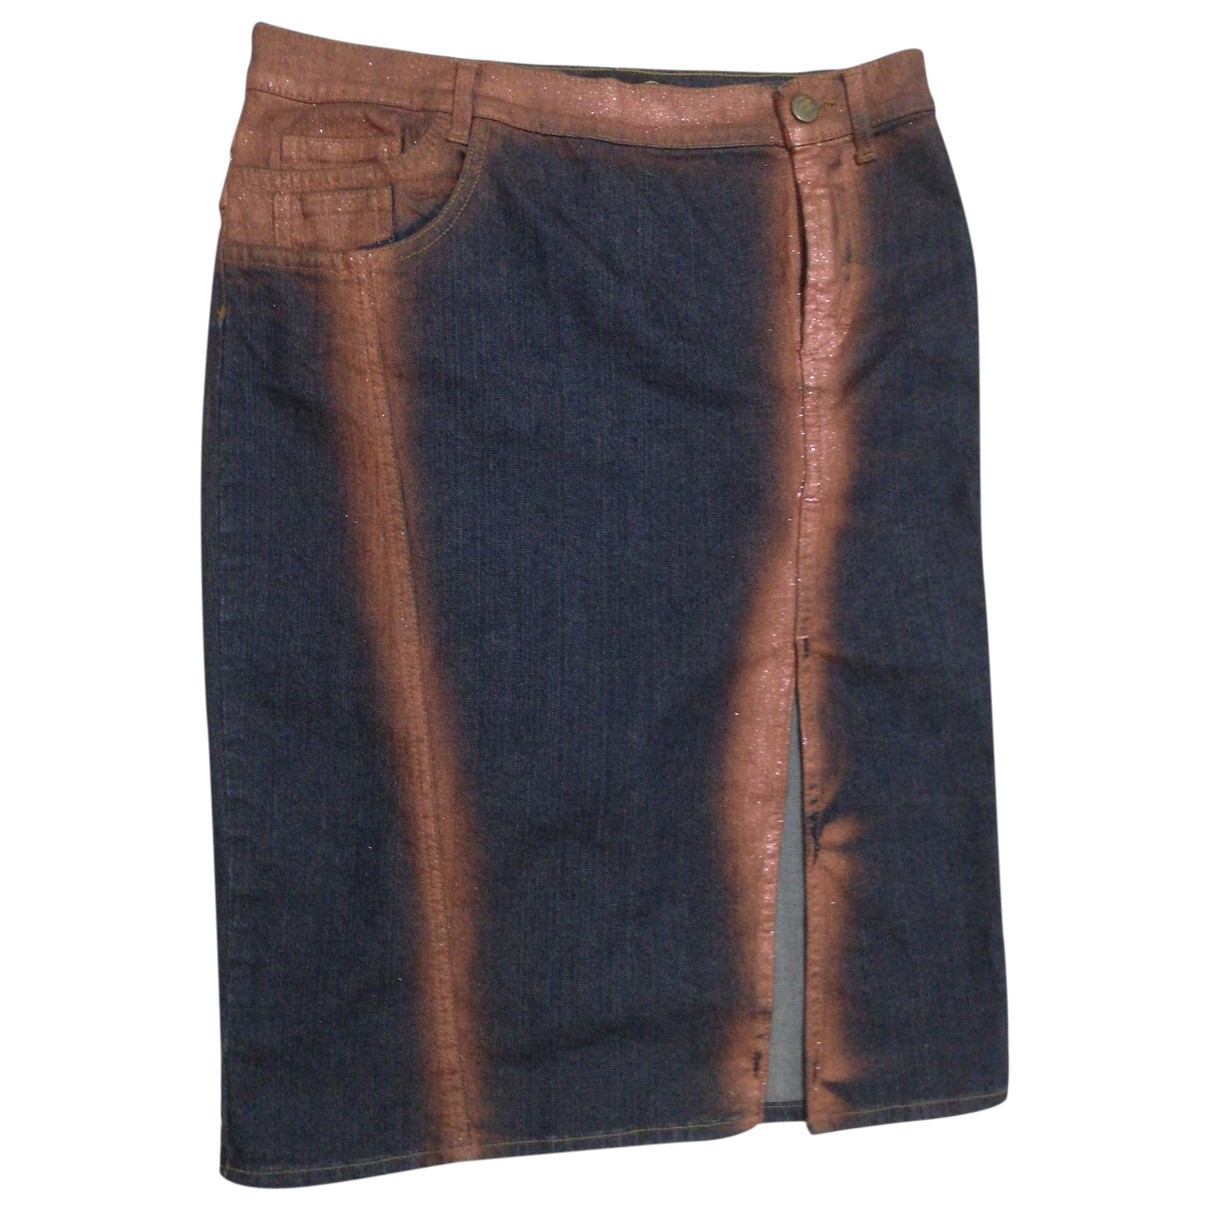 Just Cavalli \N Multicolour Cotton skirt for Women 42 IT